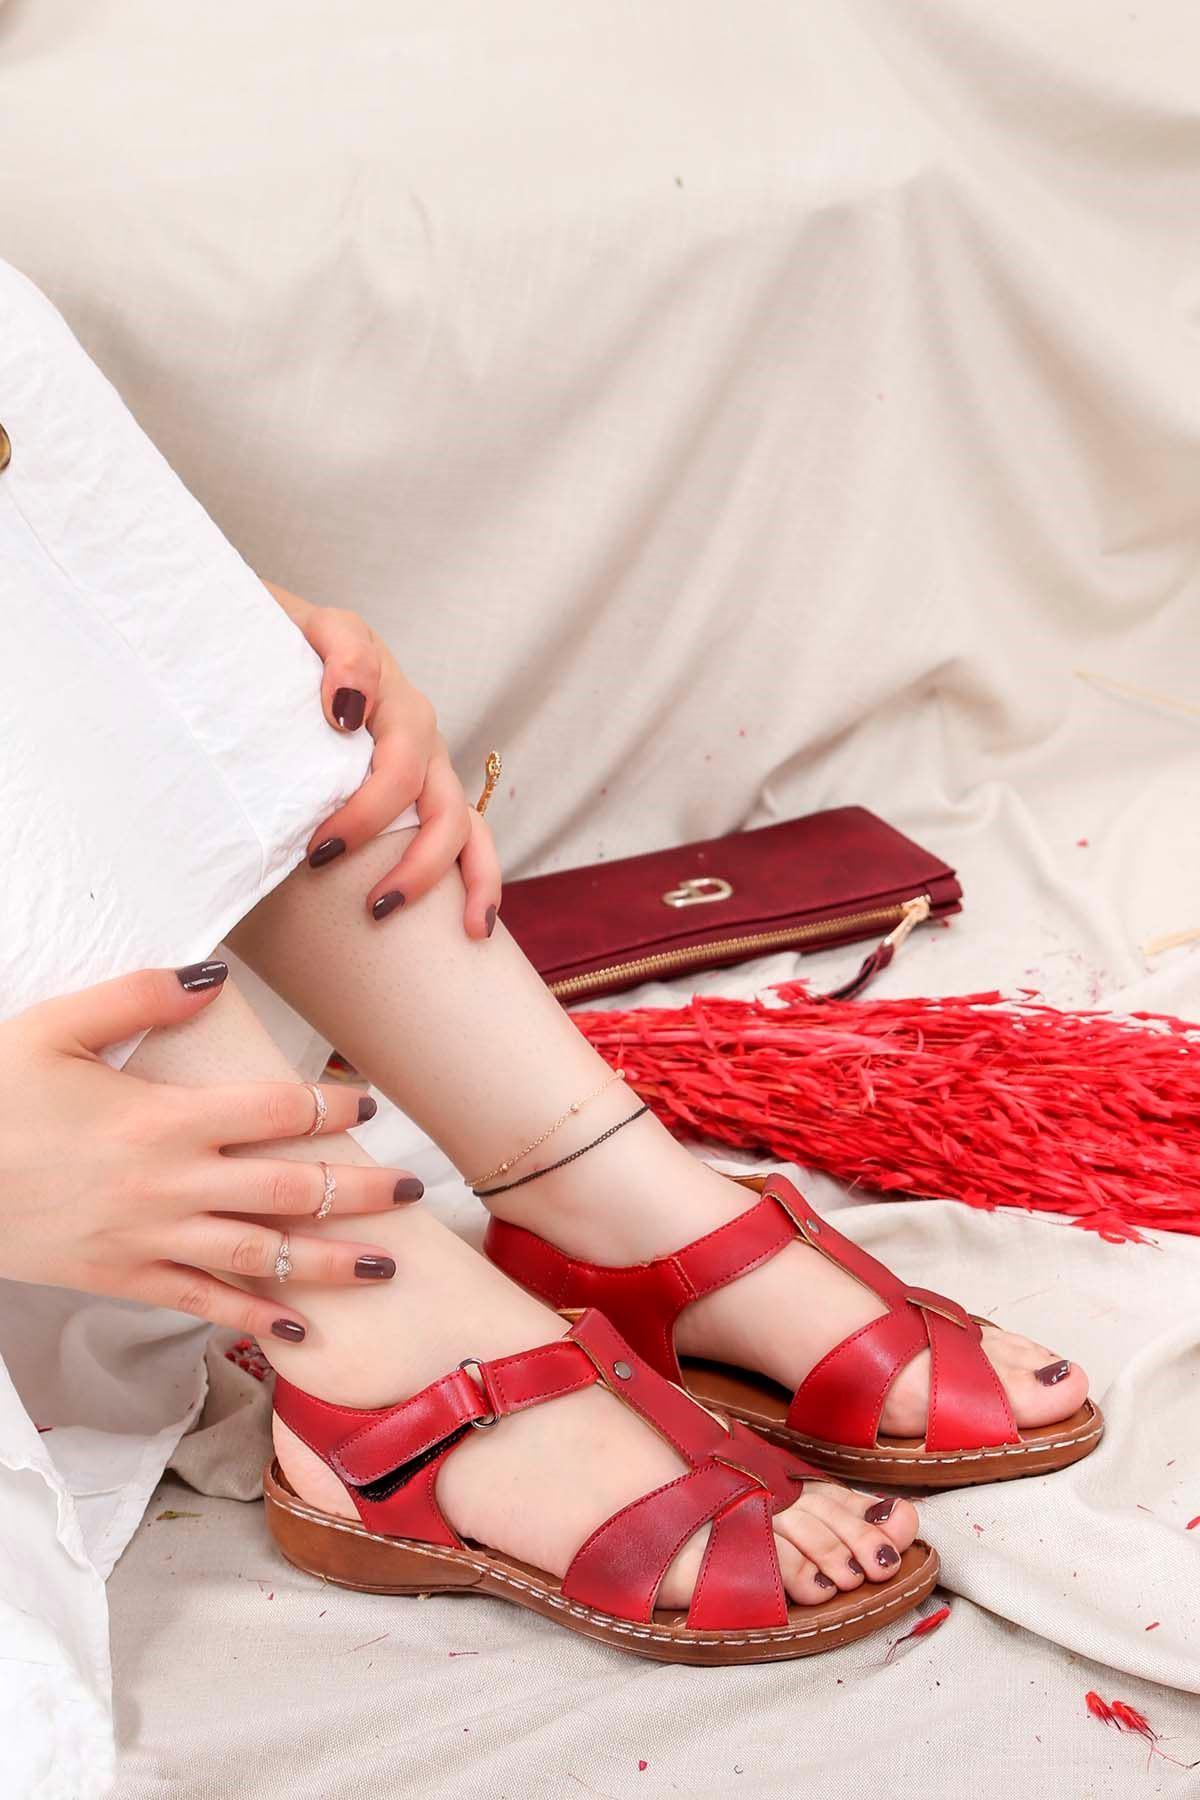 My-Fit-701 Konfor Sandalet Kırmızı deri